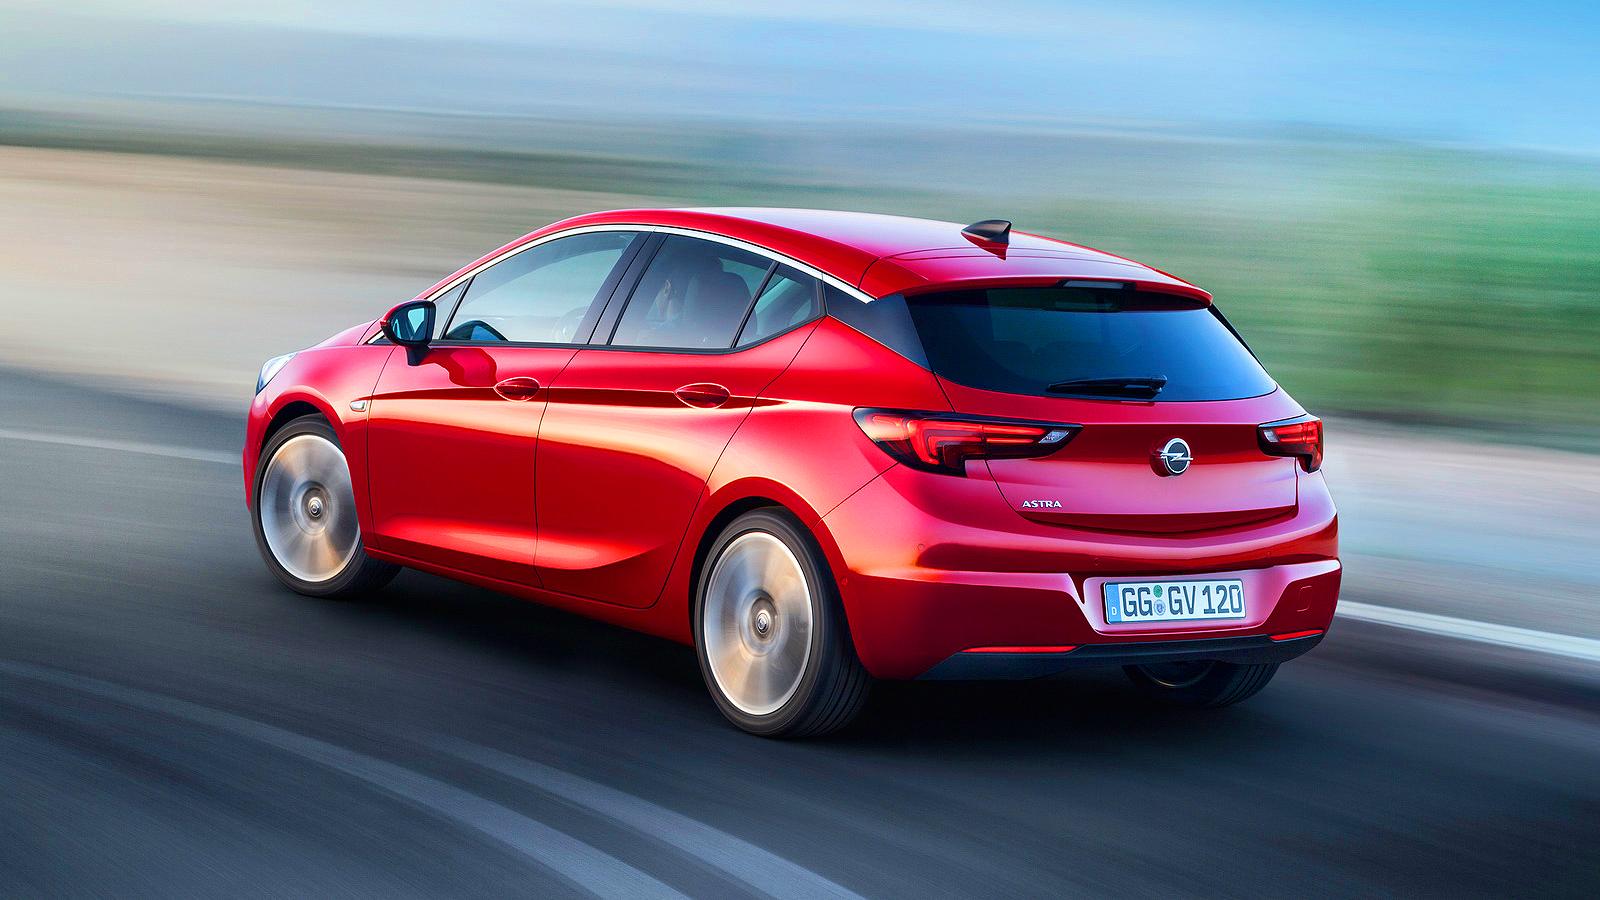 VAZOU Novo Opel Astra 2016 95 cv-200 cv | CARWP